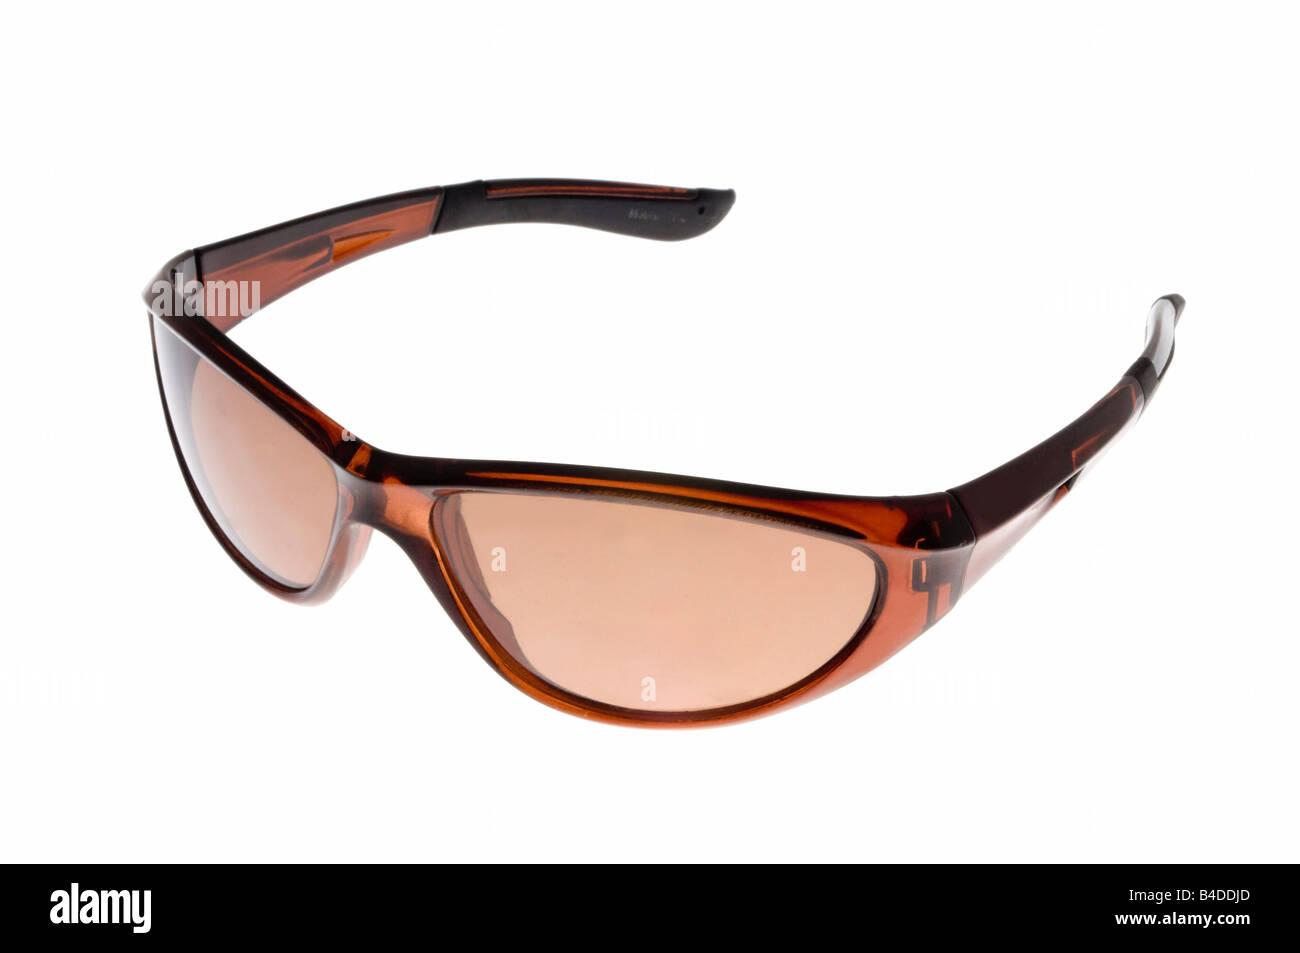 sunglasses on white - Stock Image